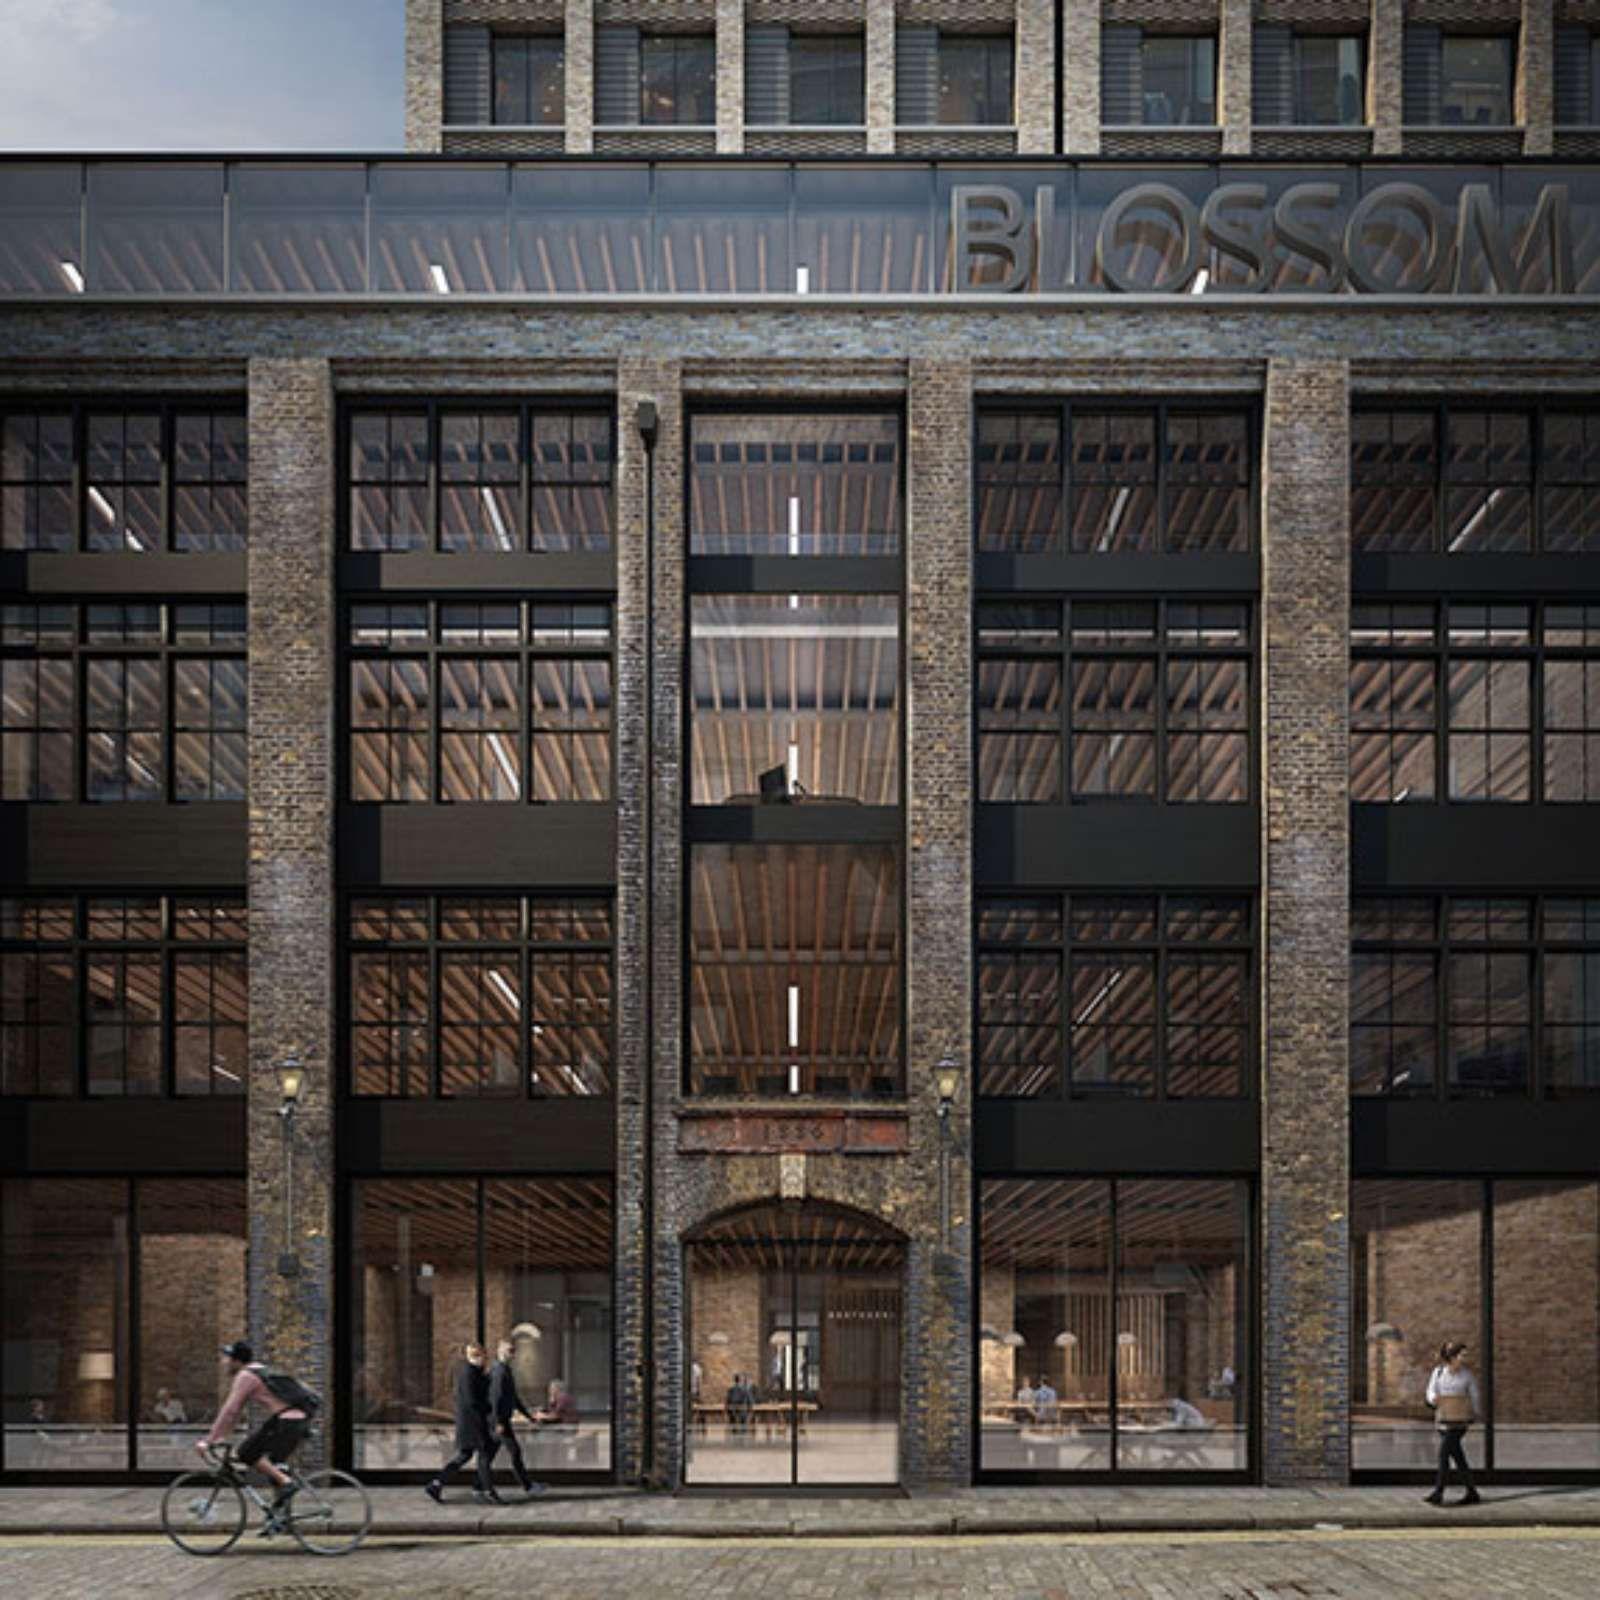 Blossom-Street-Planning-by-Duggan-Morris-Architects-17.jpg (1600×1600)